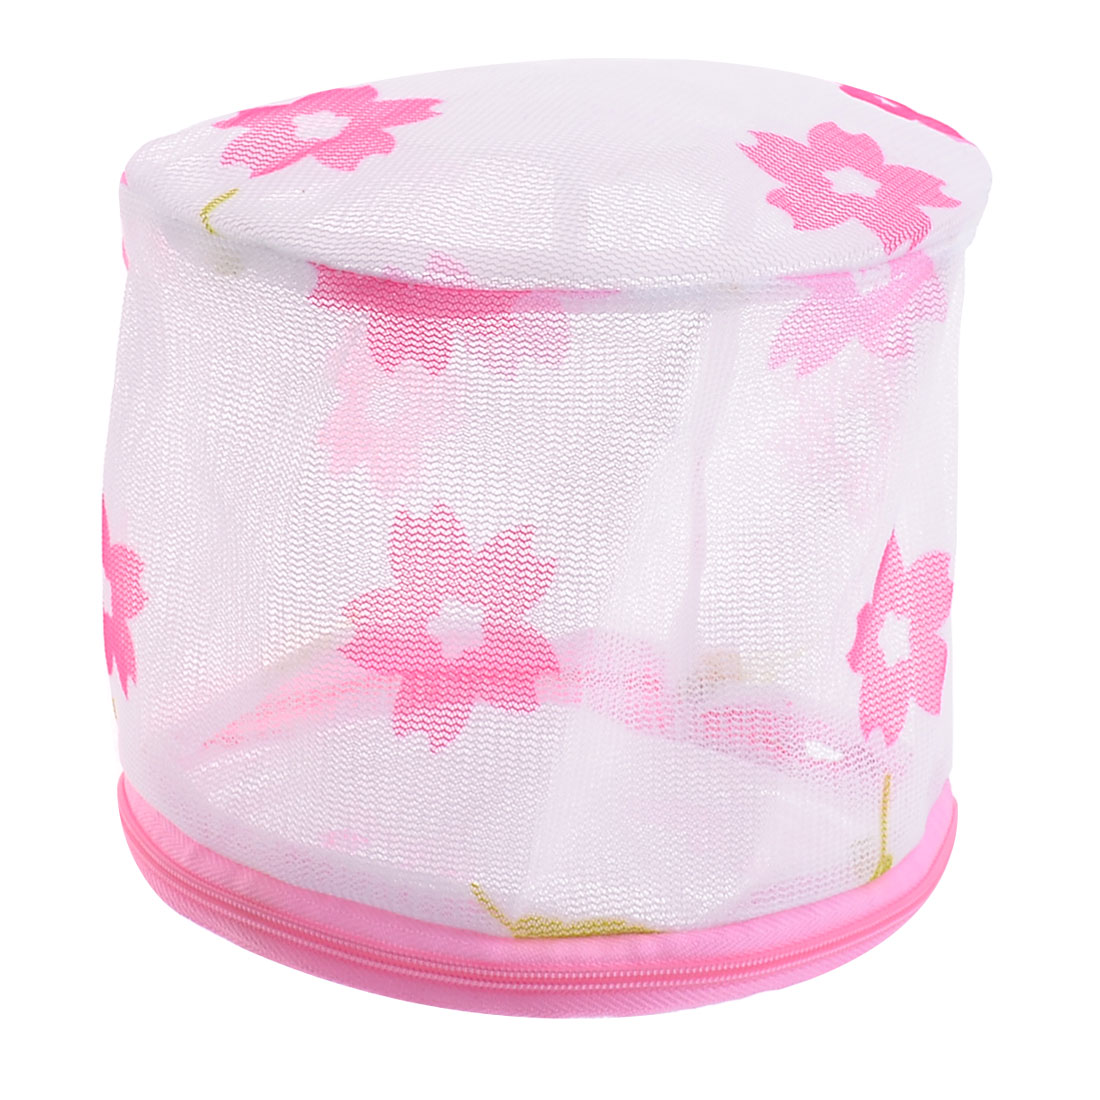 Zipper Closure Flower Pattern Foldable Underwear Wash Washing Bag White Pink